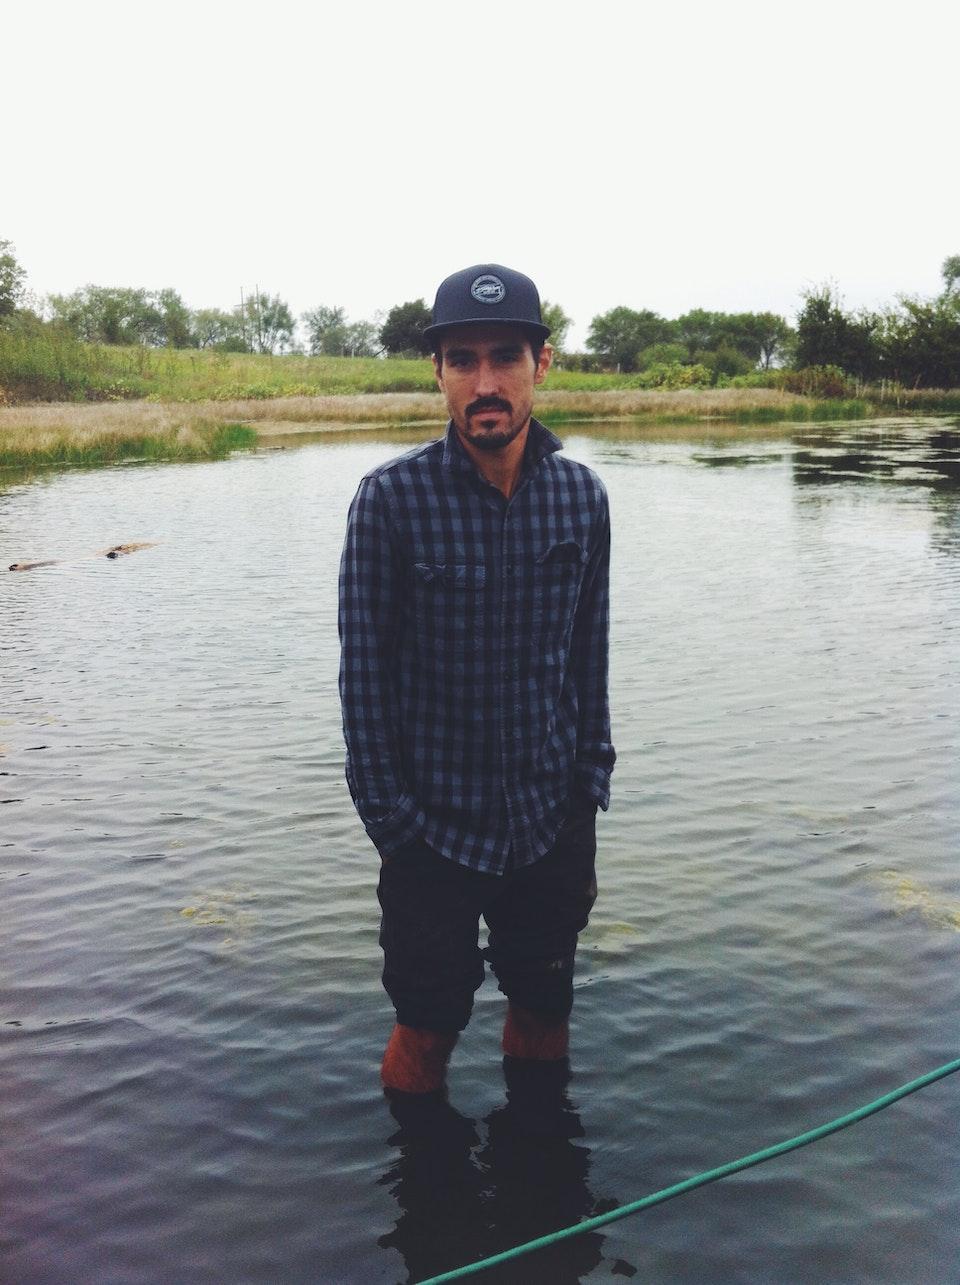 FLUIDIC pond_jordan